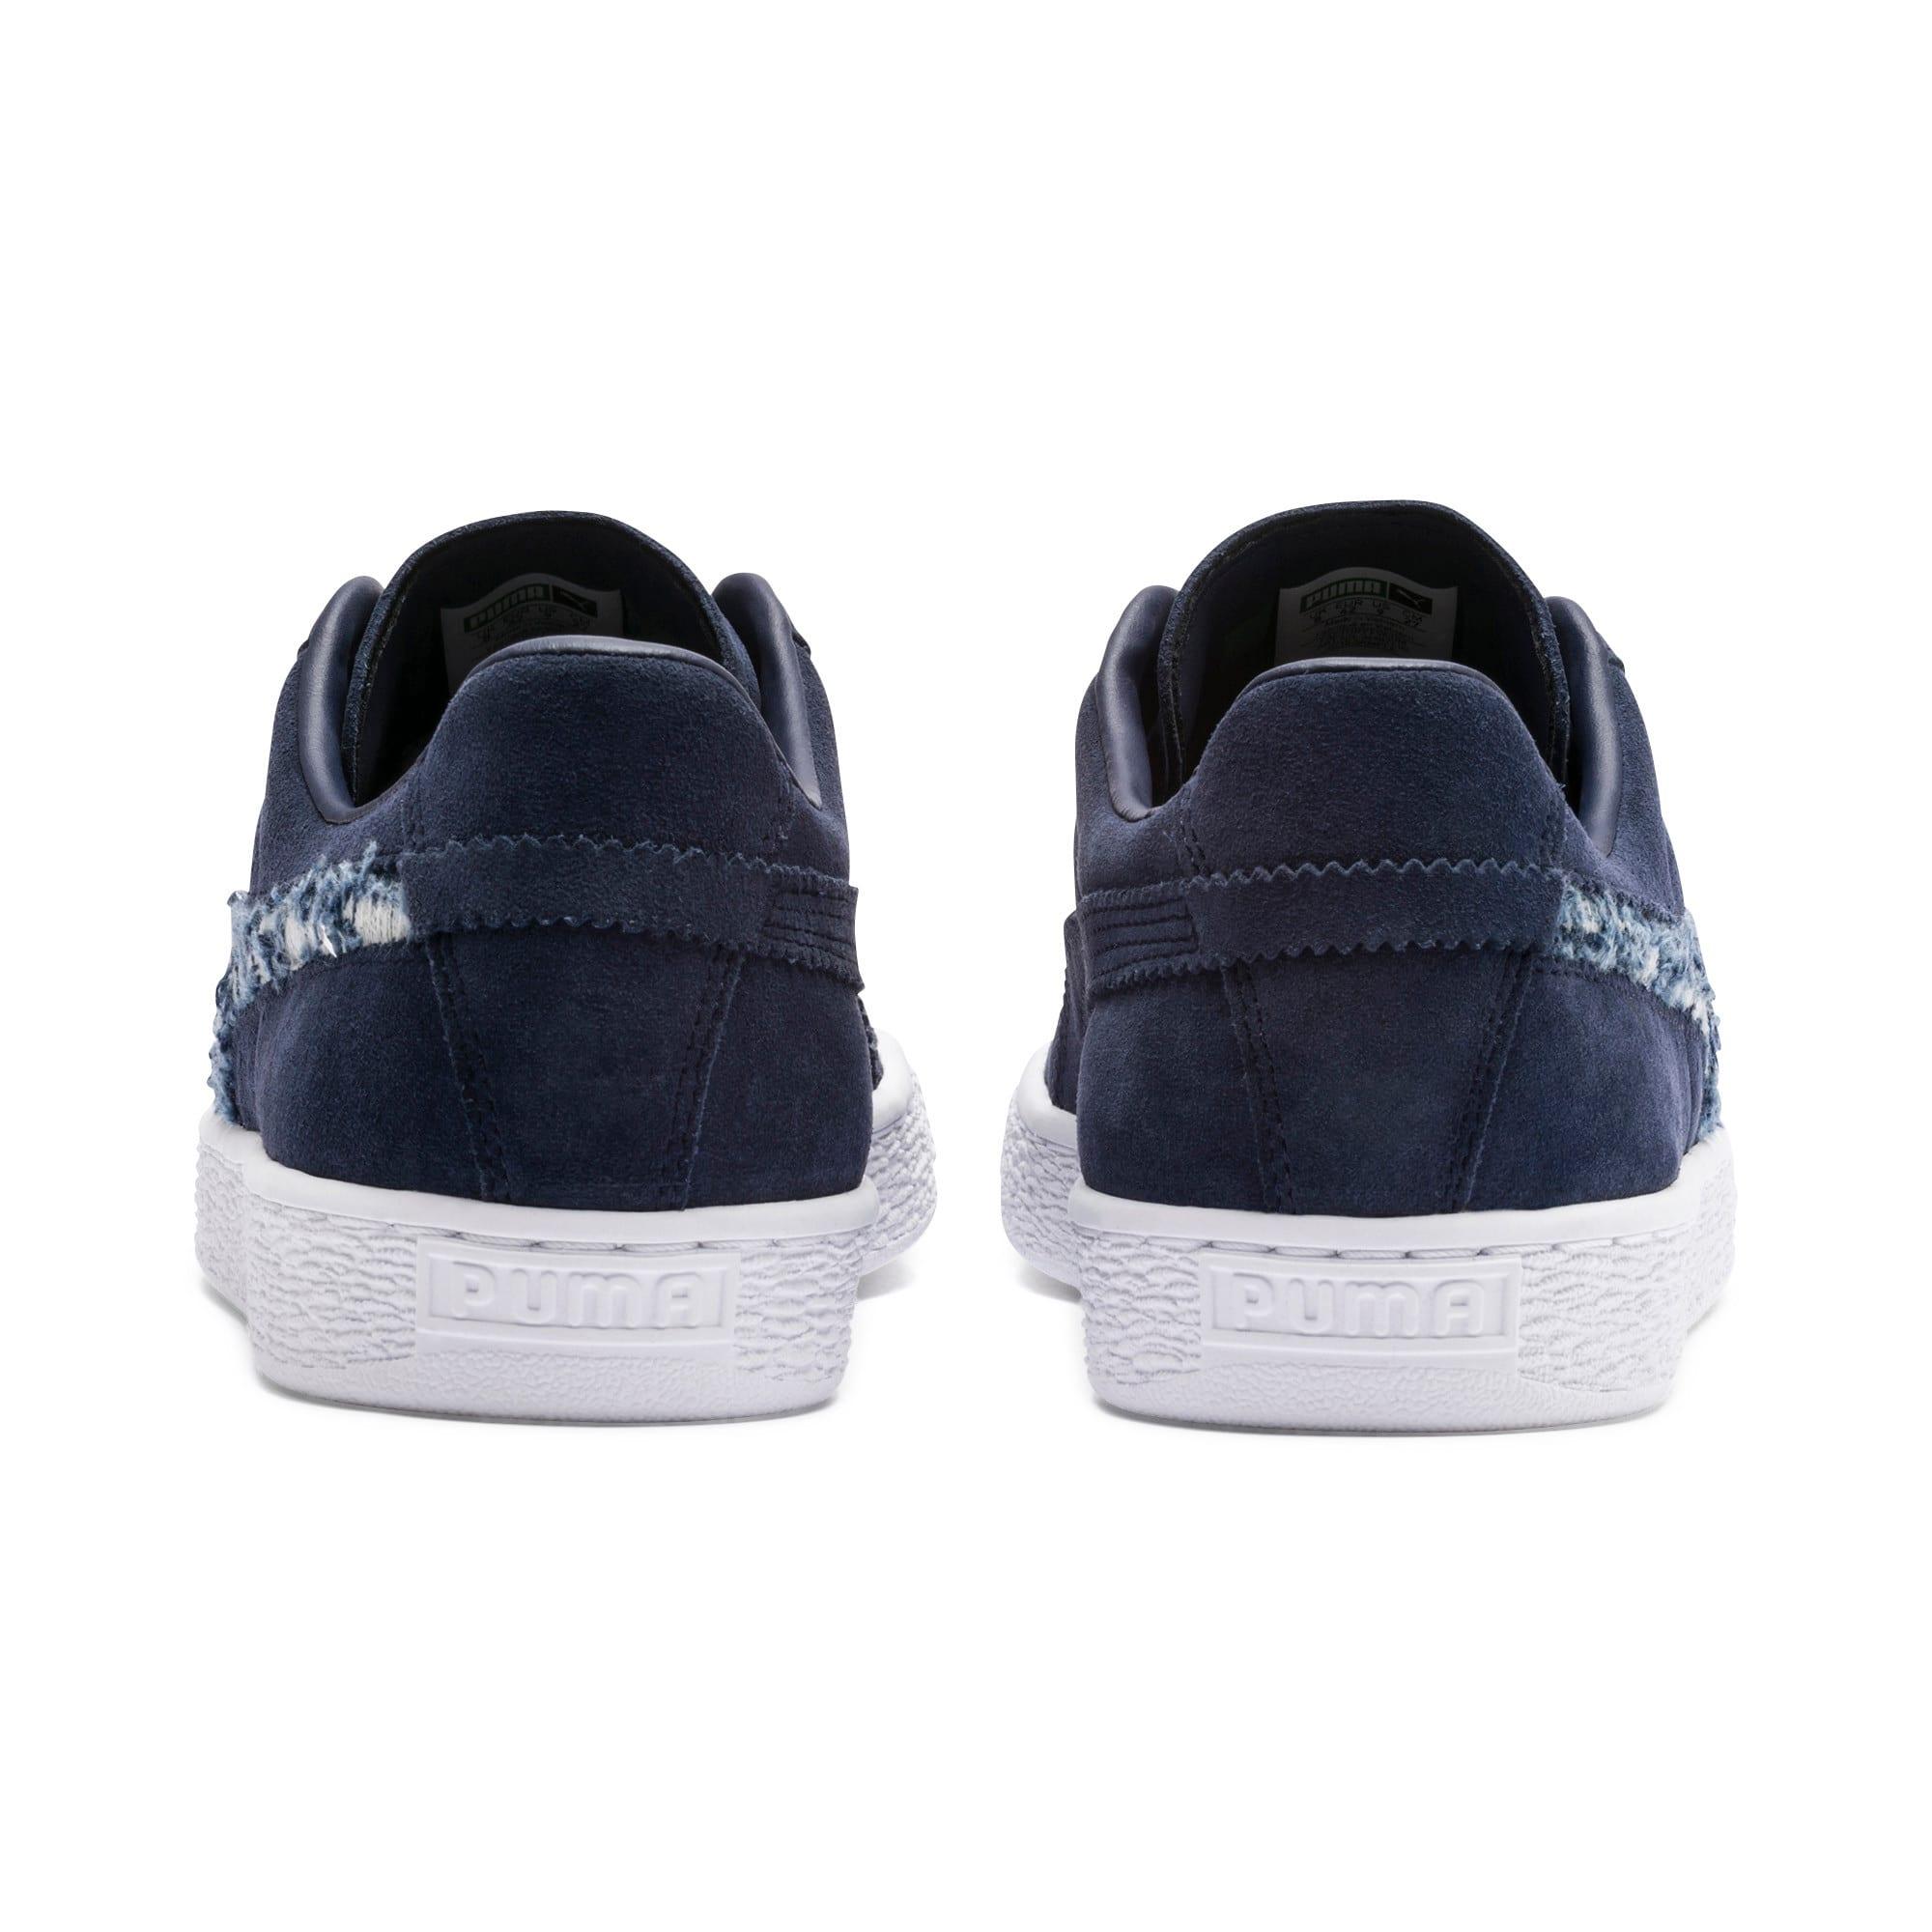 Thumbnail 5 of Suede Ripped Denim Sneakers, Peacoat-Peacoat-Puma White, medium